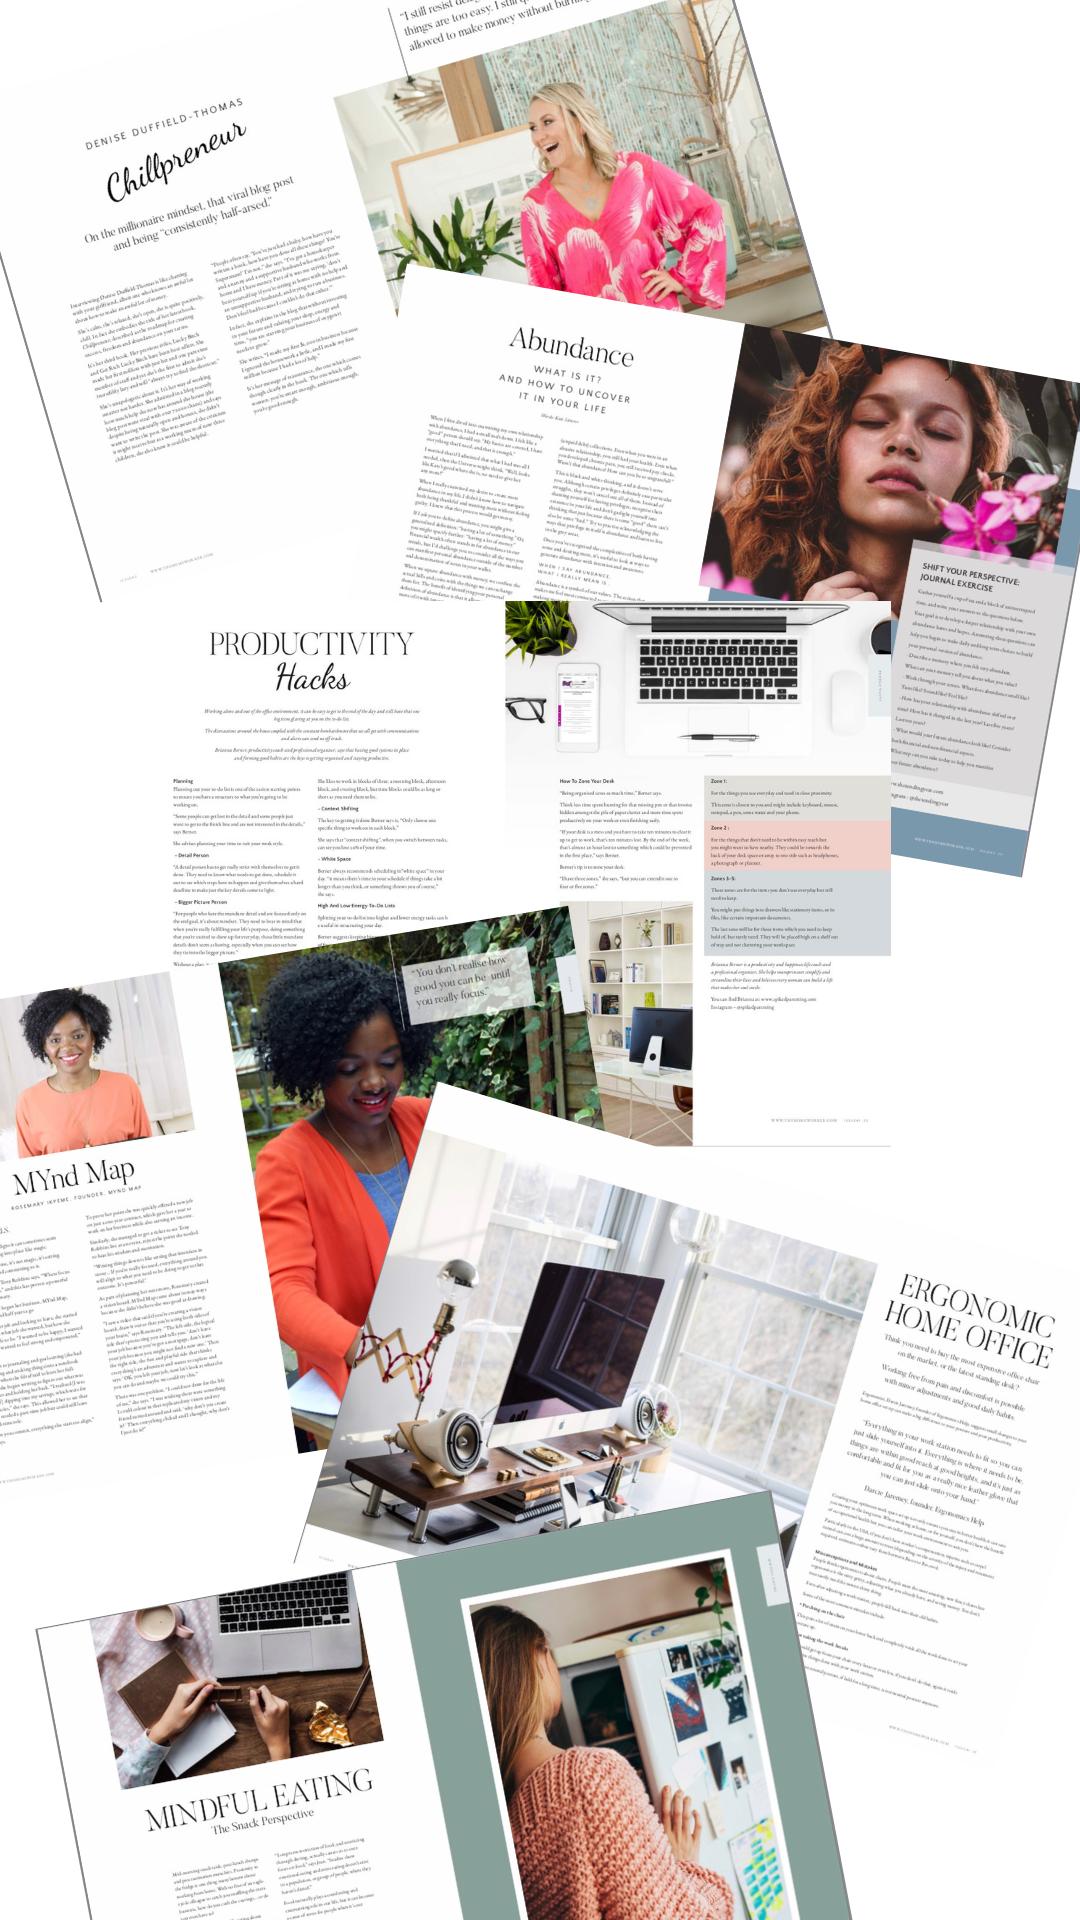 work from home, freelance tips, self-employment, money blocks, abundance, the homeworker magazine